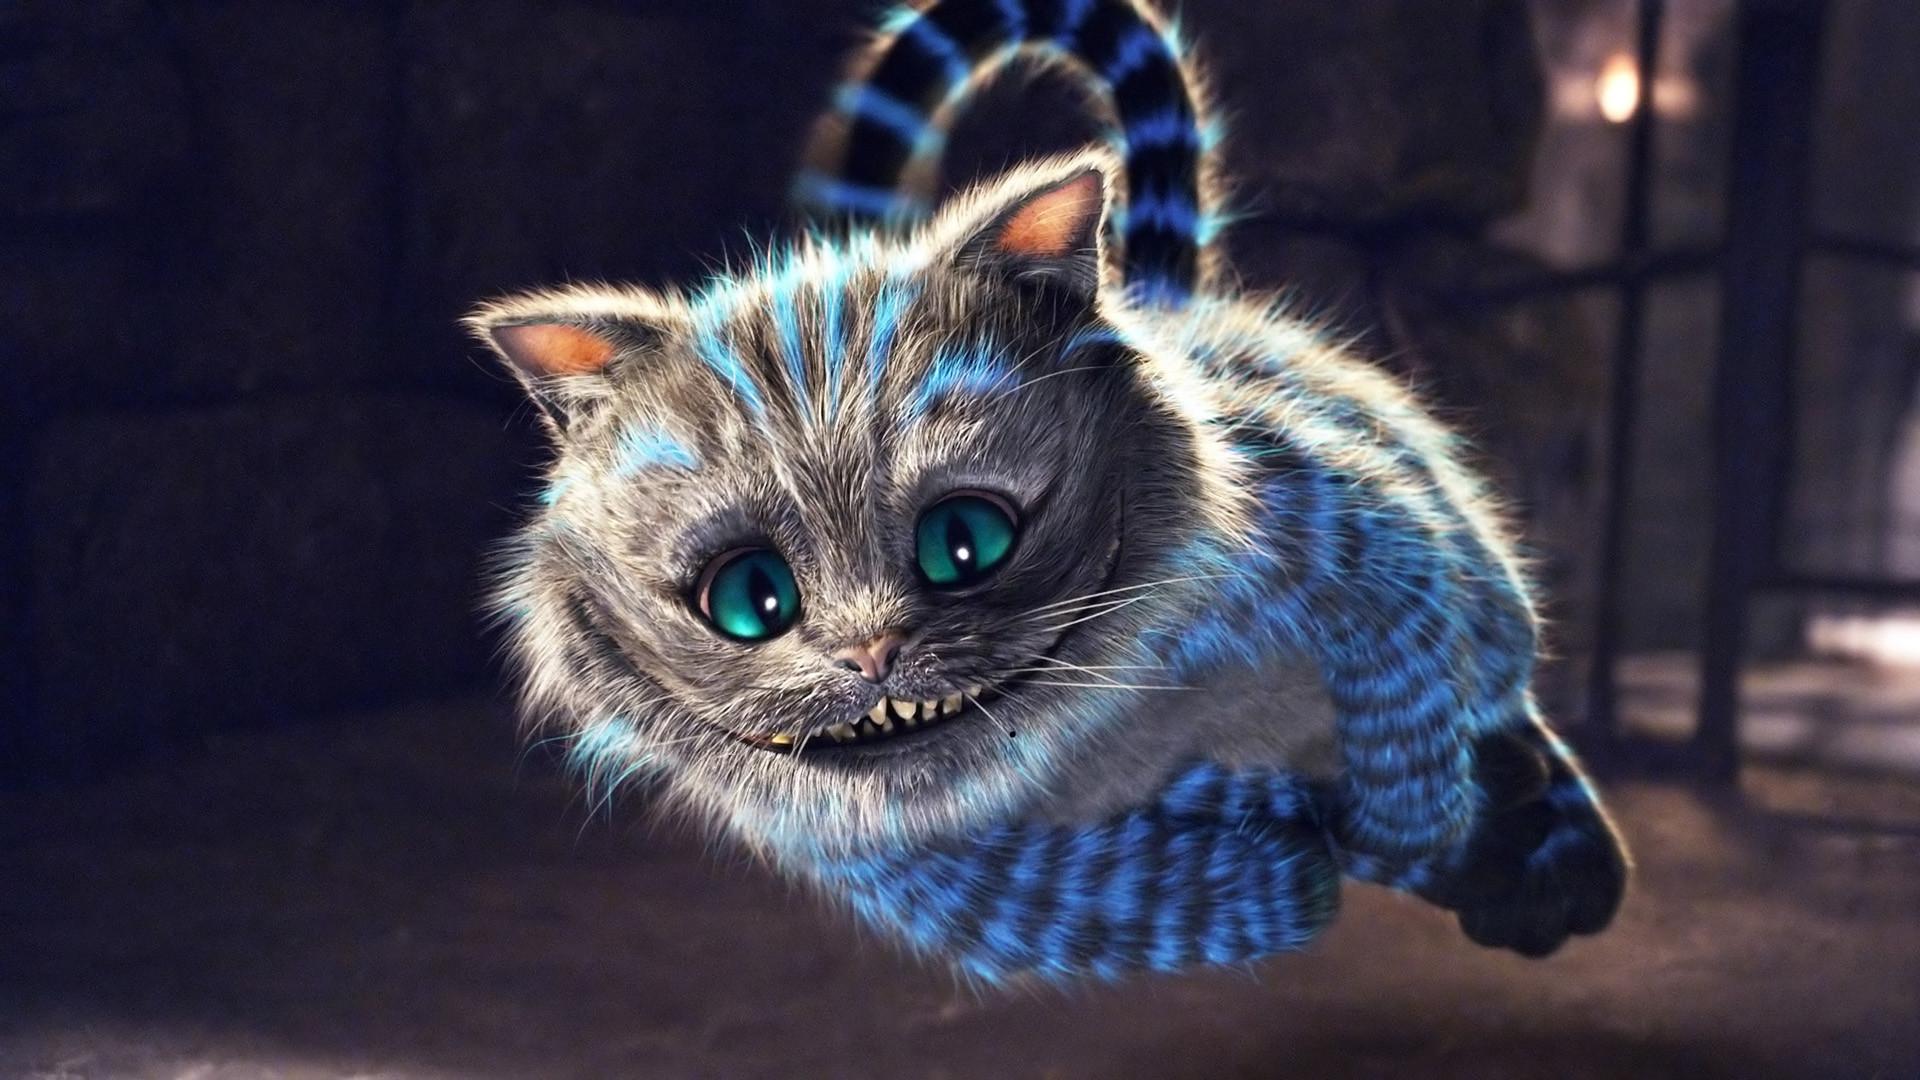 Alice in Wonderland Movie Wallpapers Collection 6 (1920 x 1080 pixels) –  Digital Citizen